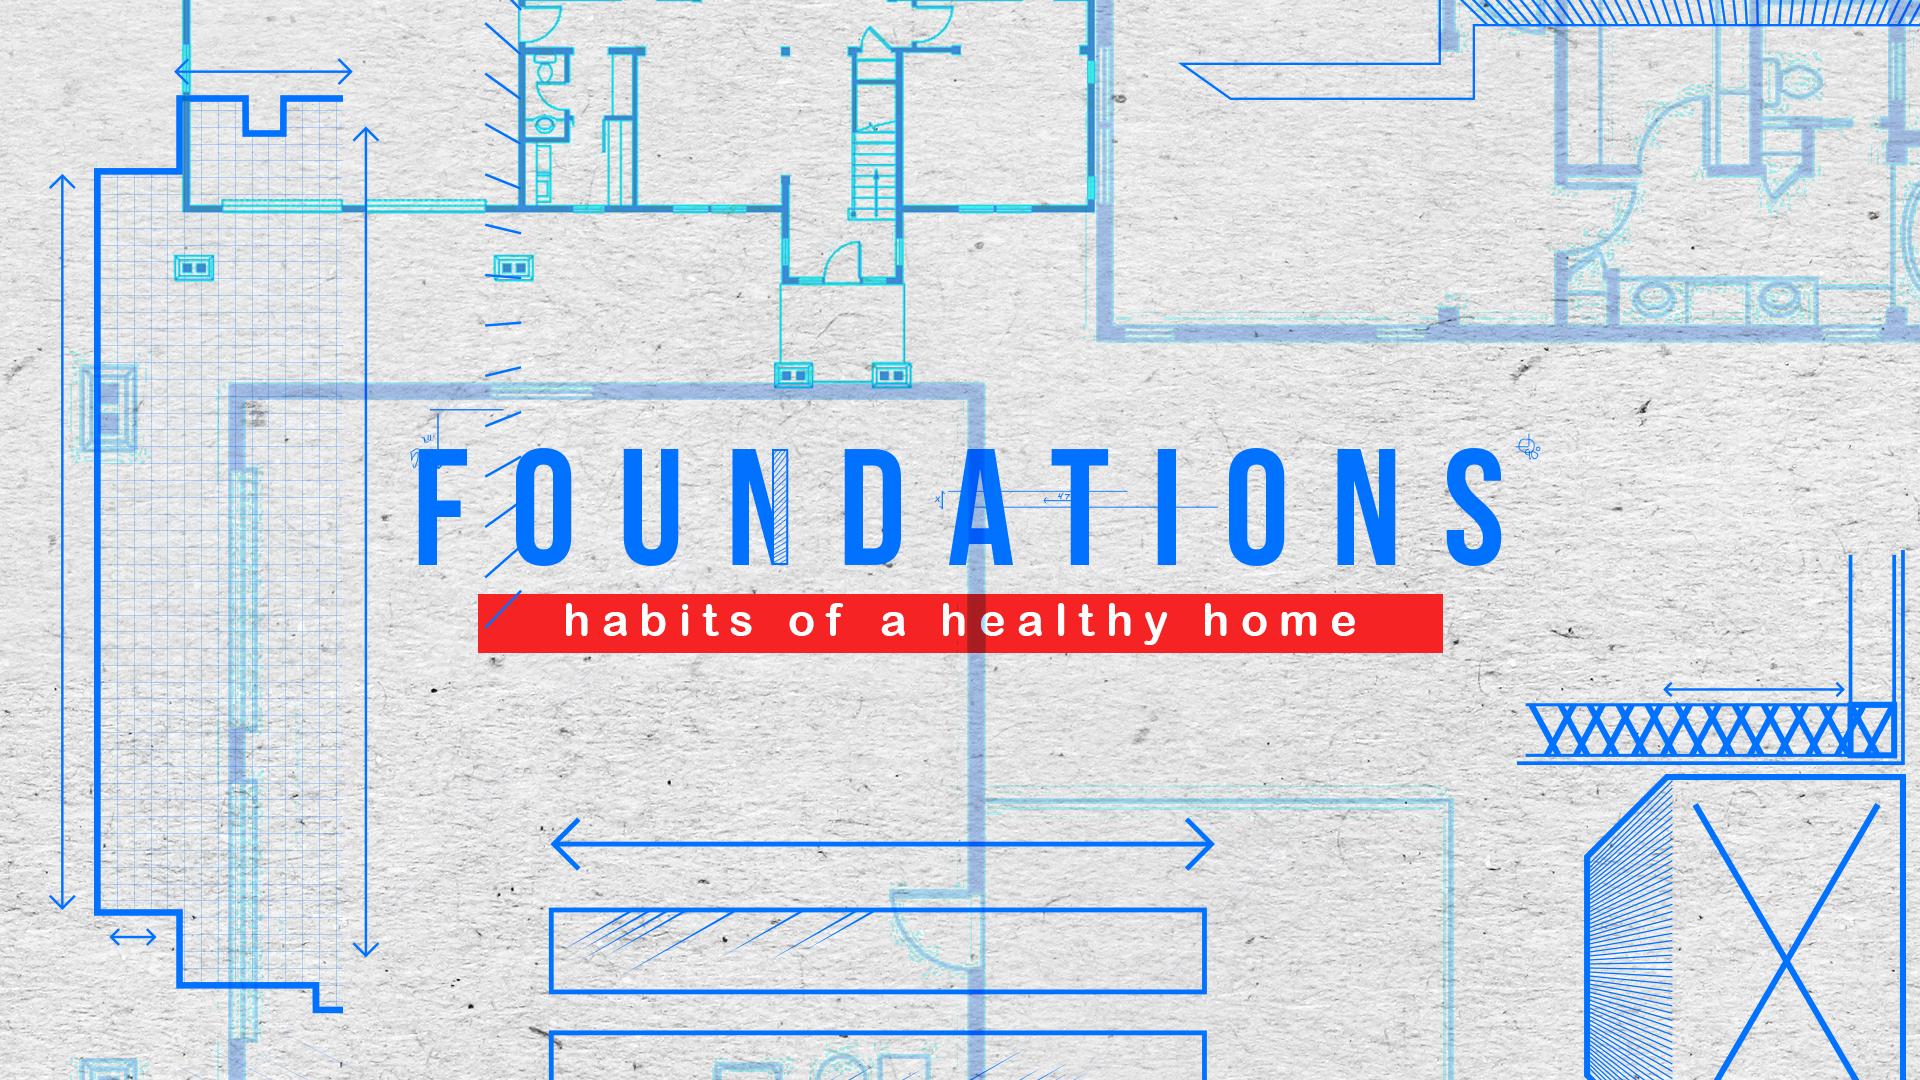 Foundations_1920x1080_FinalArtboard-1.png